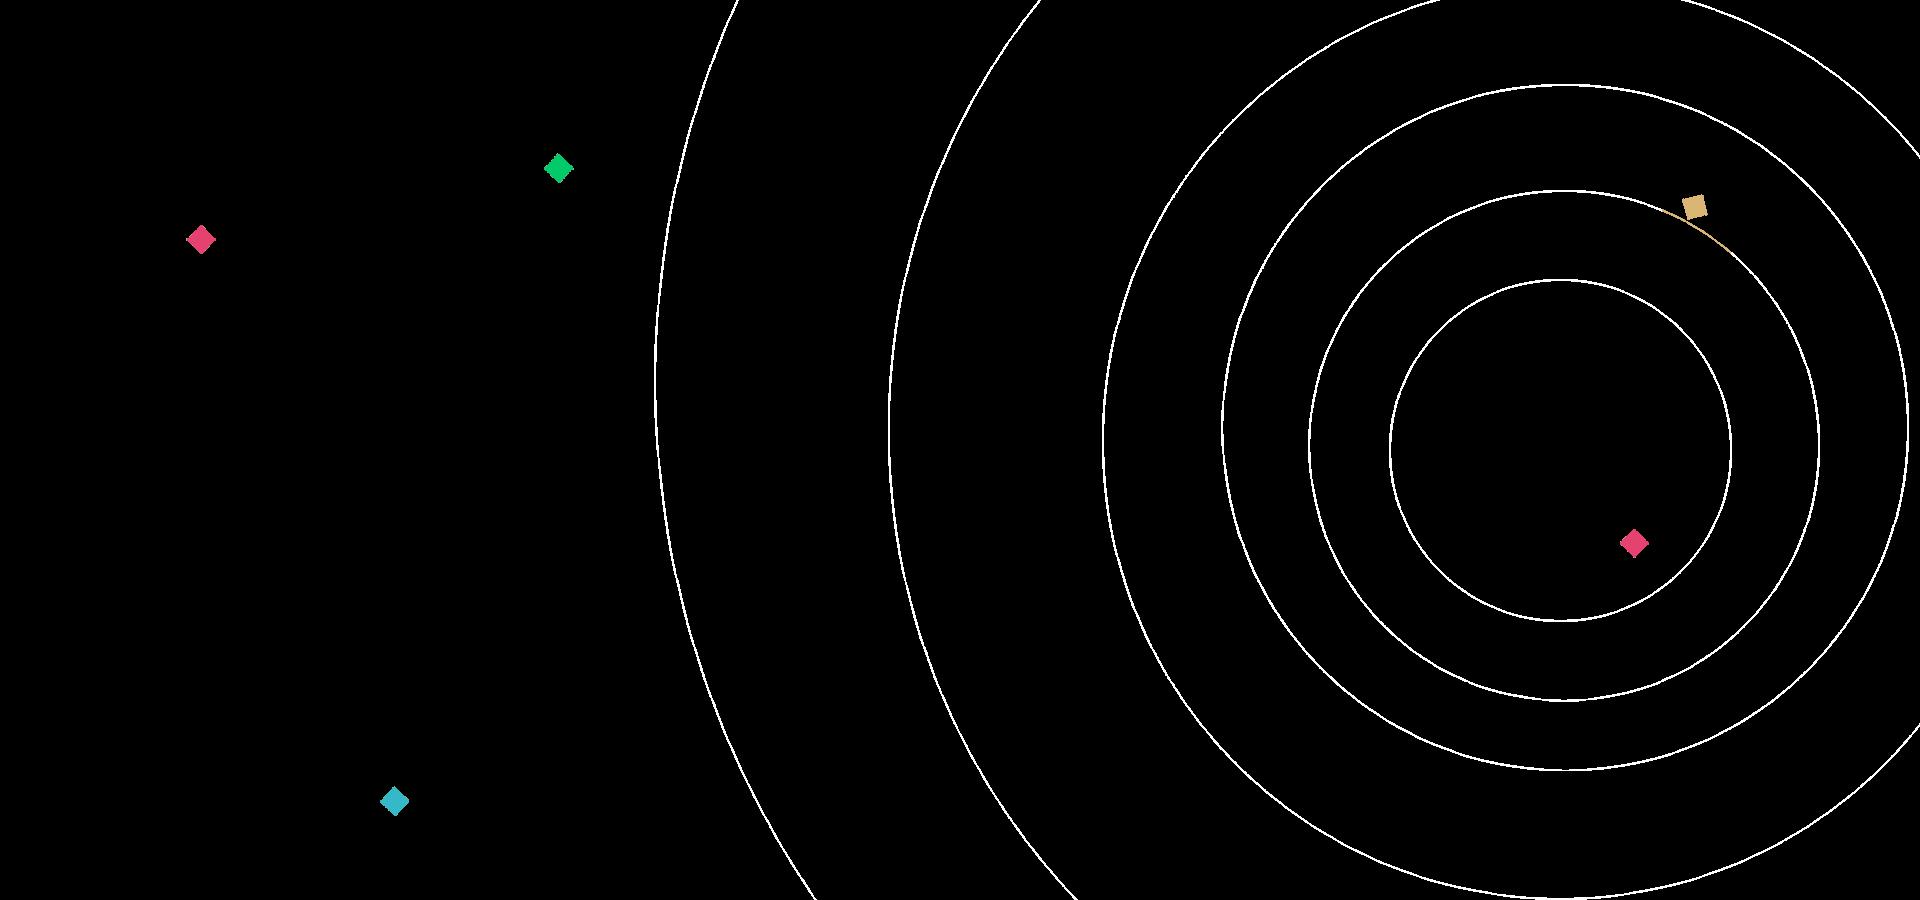 pattern_background